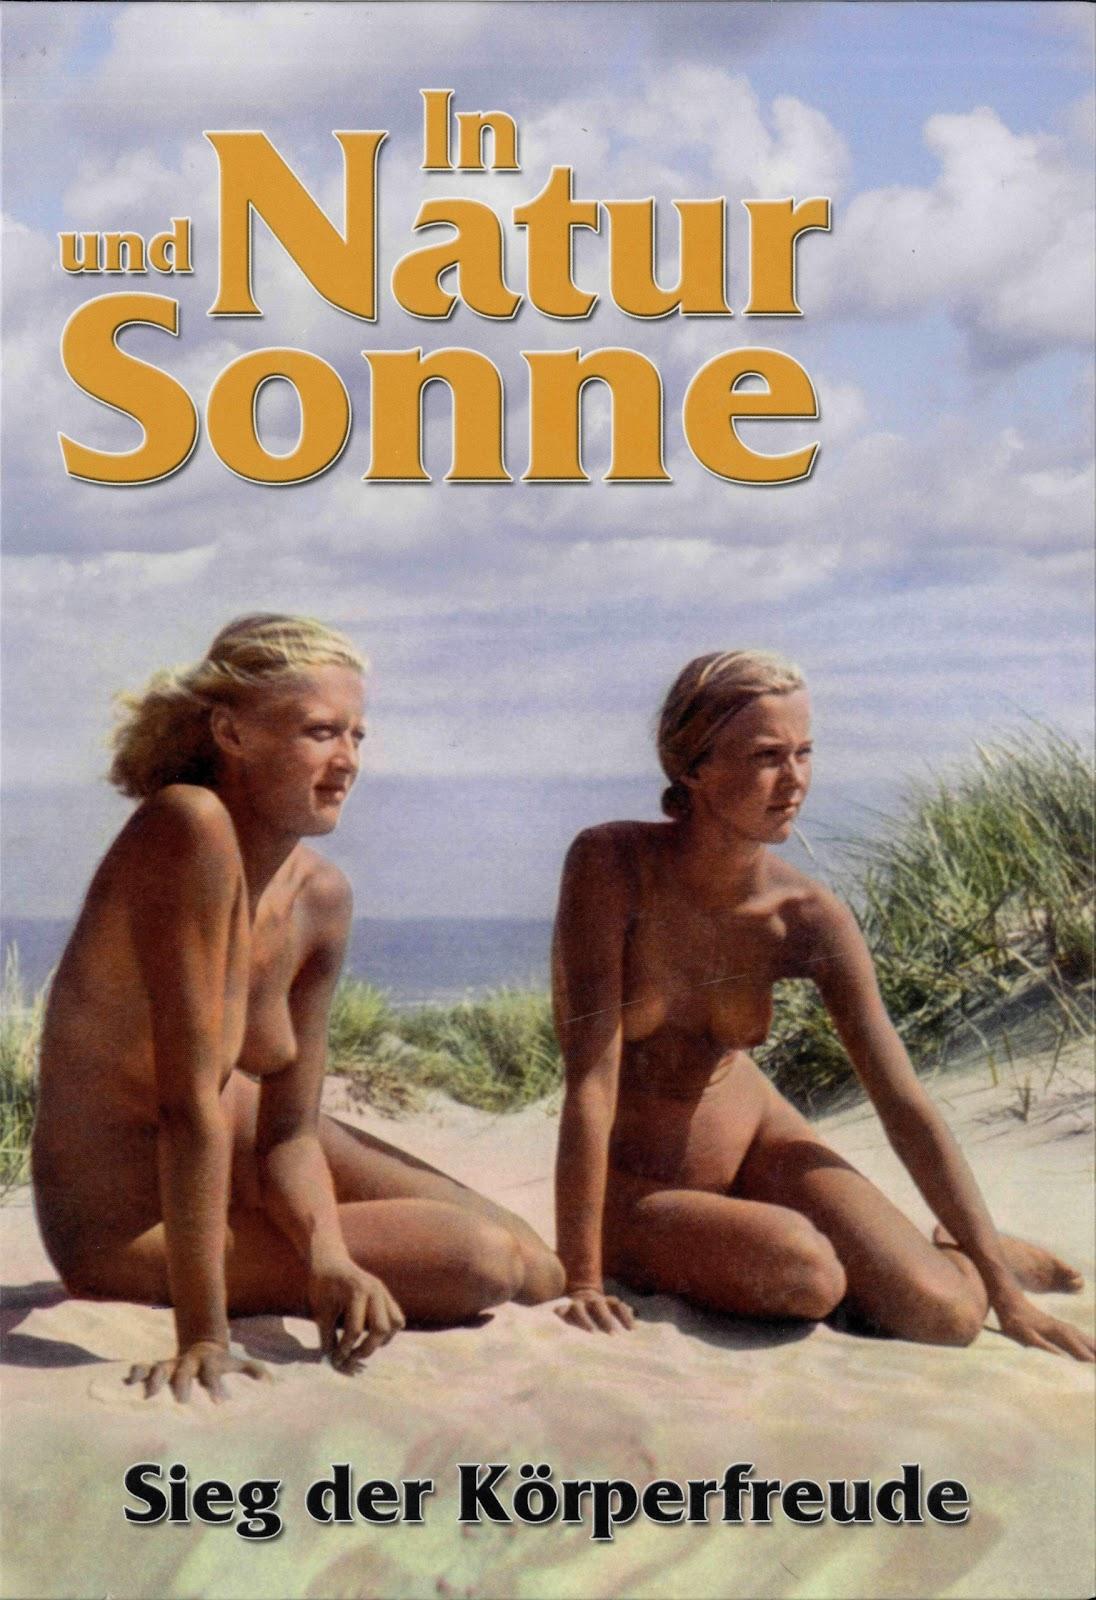 nude plus size girl